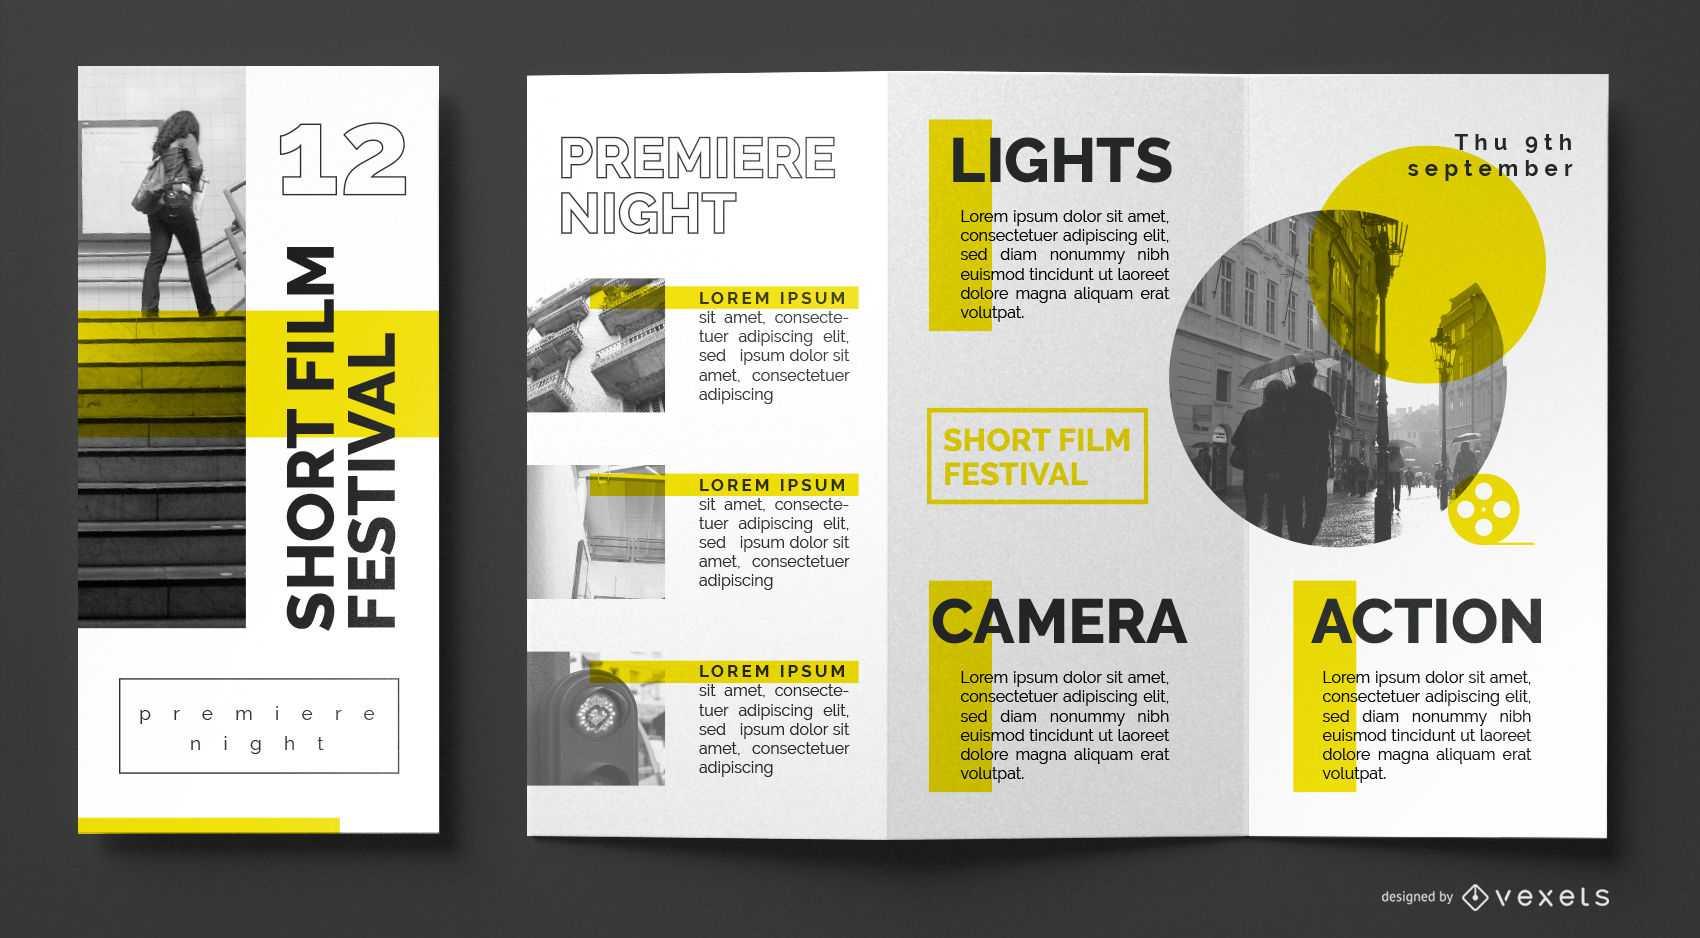 Film Festival Brochure Template - Vector Download For Film Festival Brochure Template